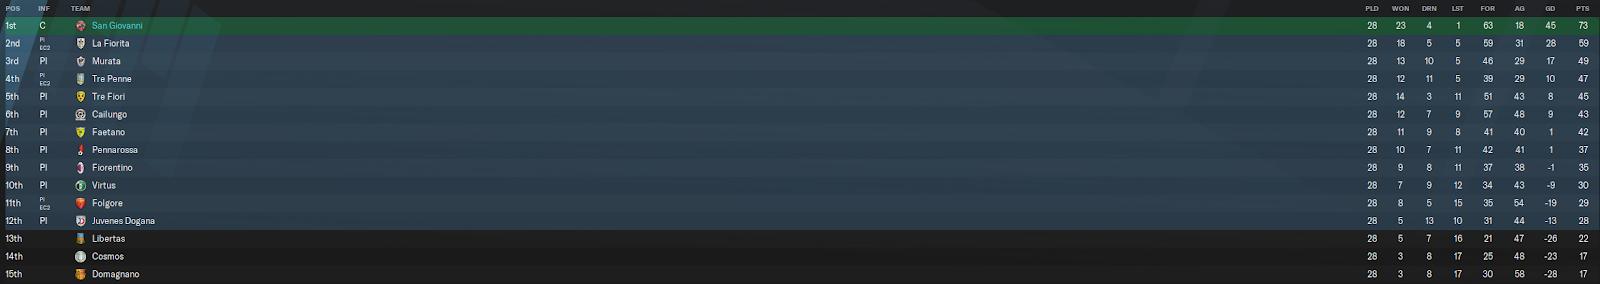 25-26 league table.PNG